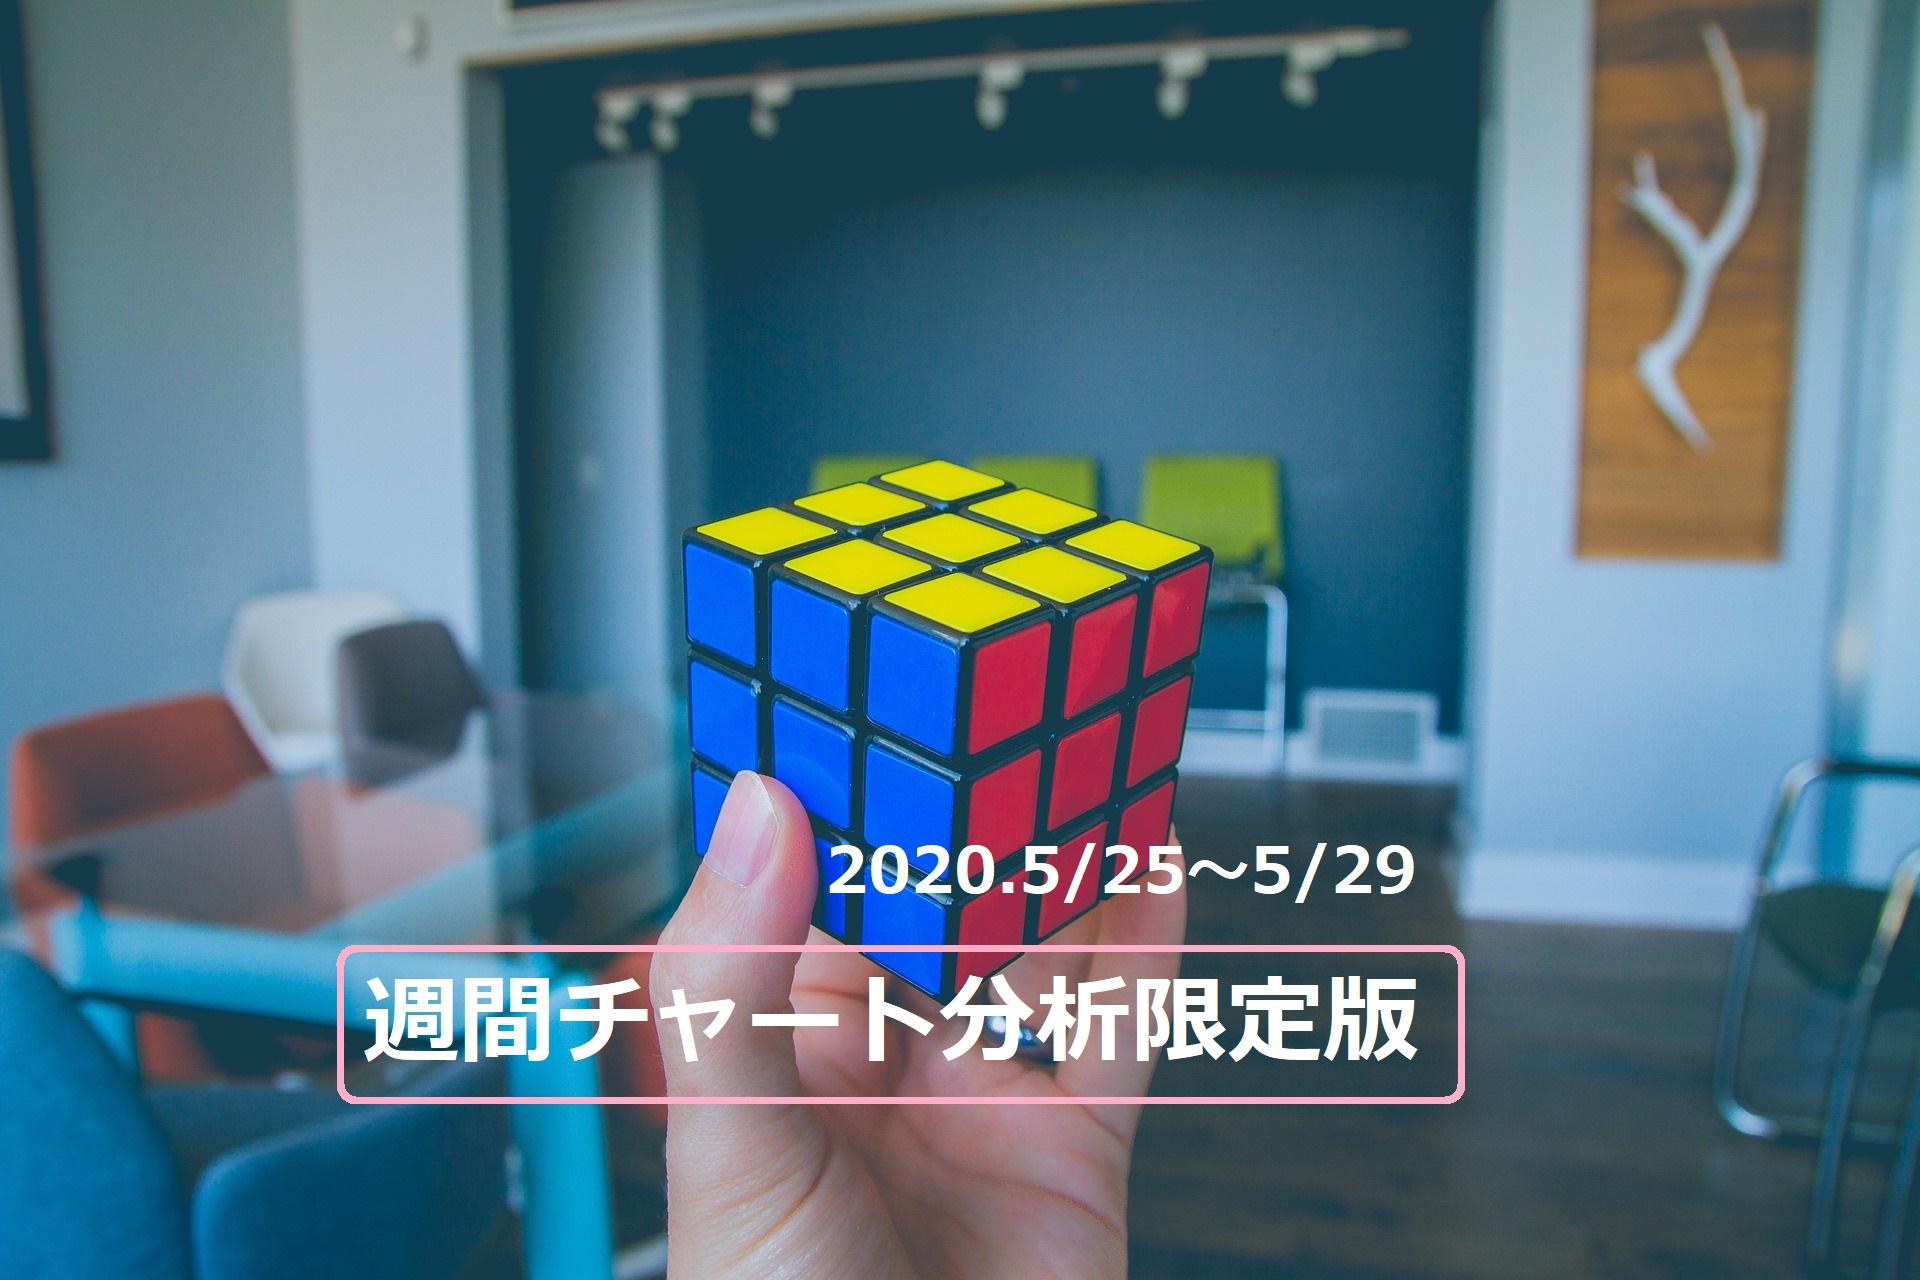 【FX】週間チャート分析限定版【2020.5/25~5/29】